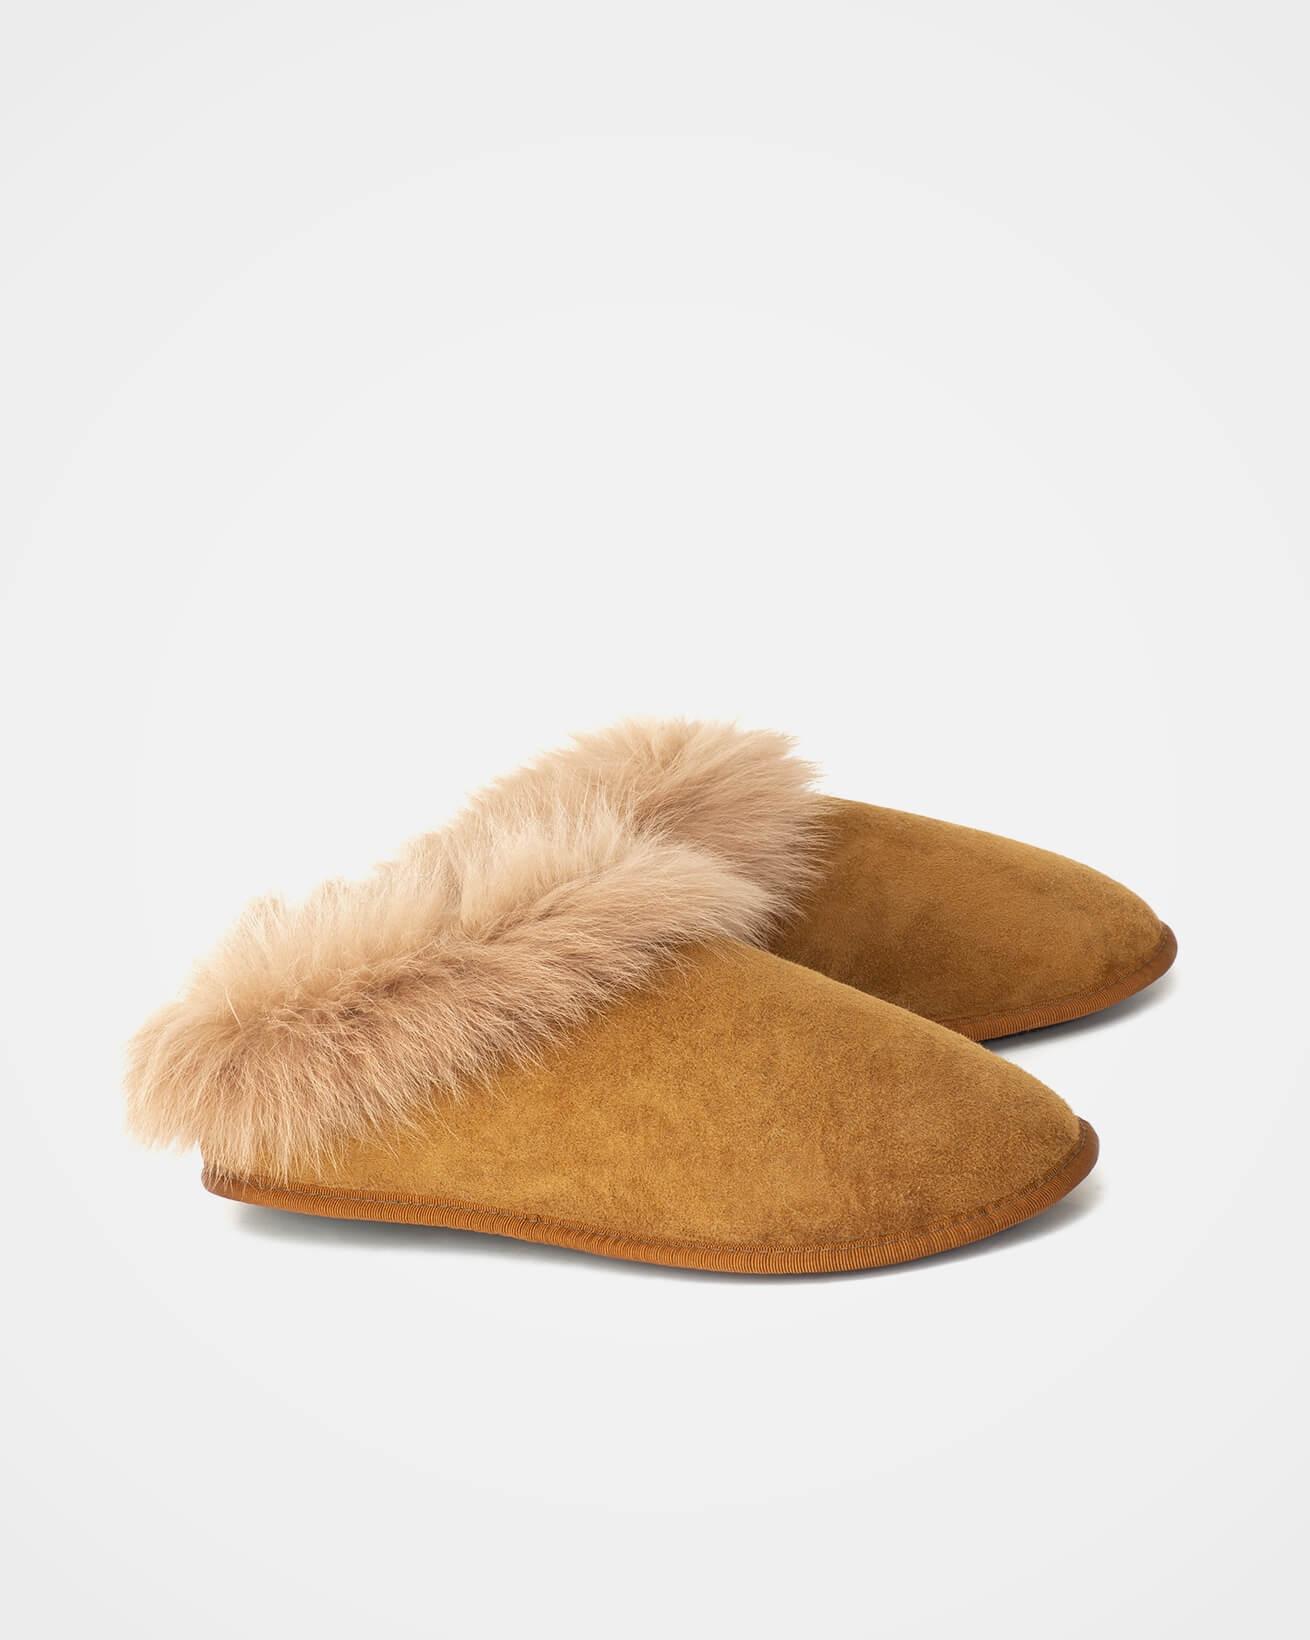 Toscana Cobi Slipper - Size 7 - Spice - 1634